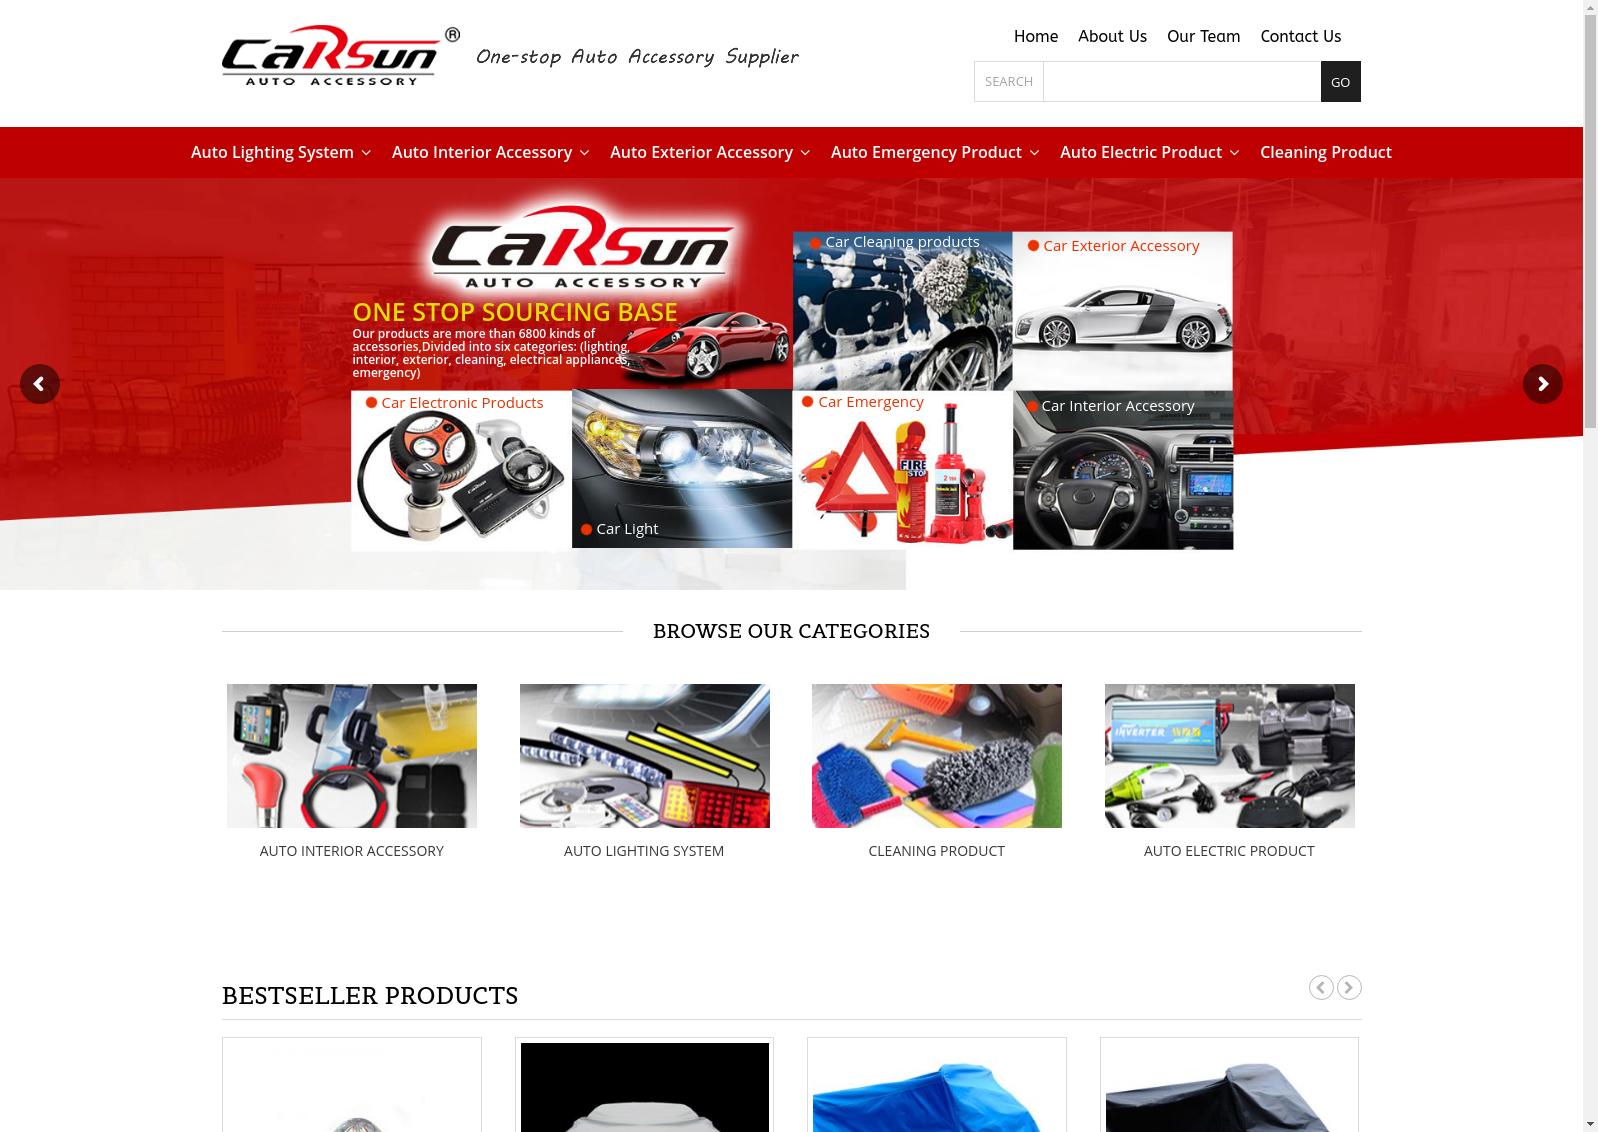 www carsun com urlscan io